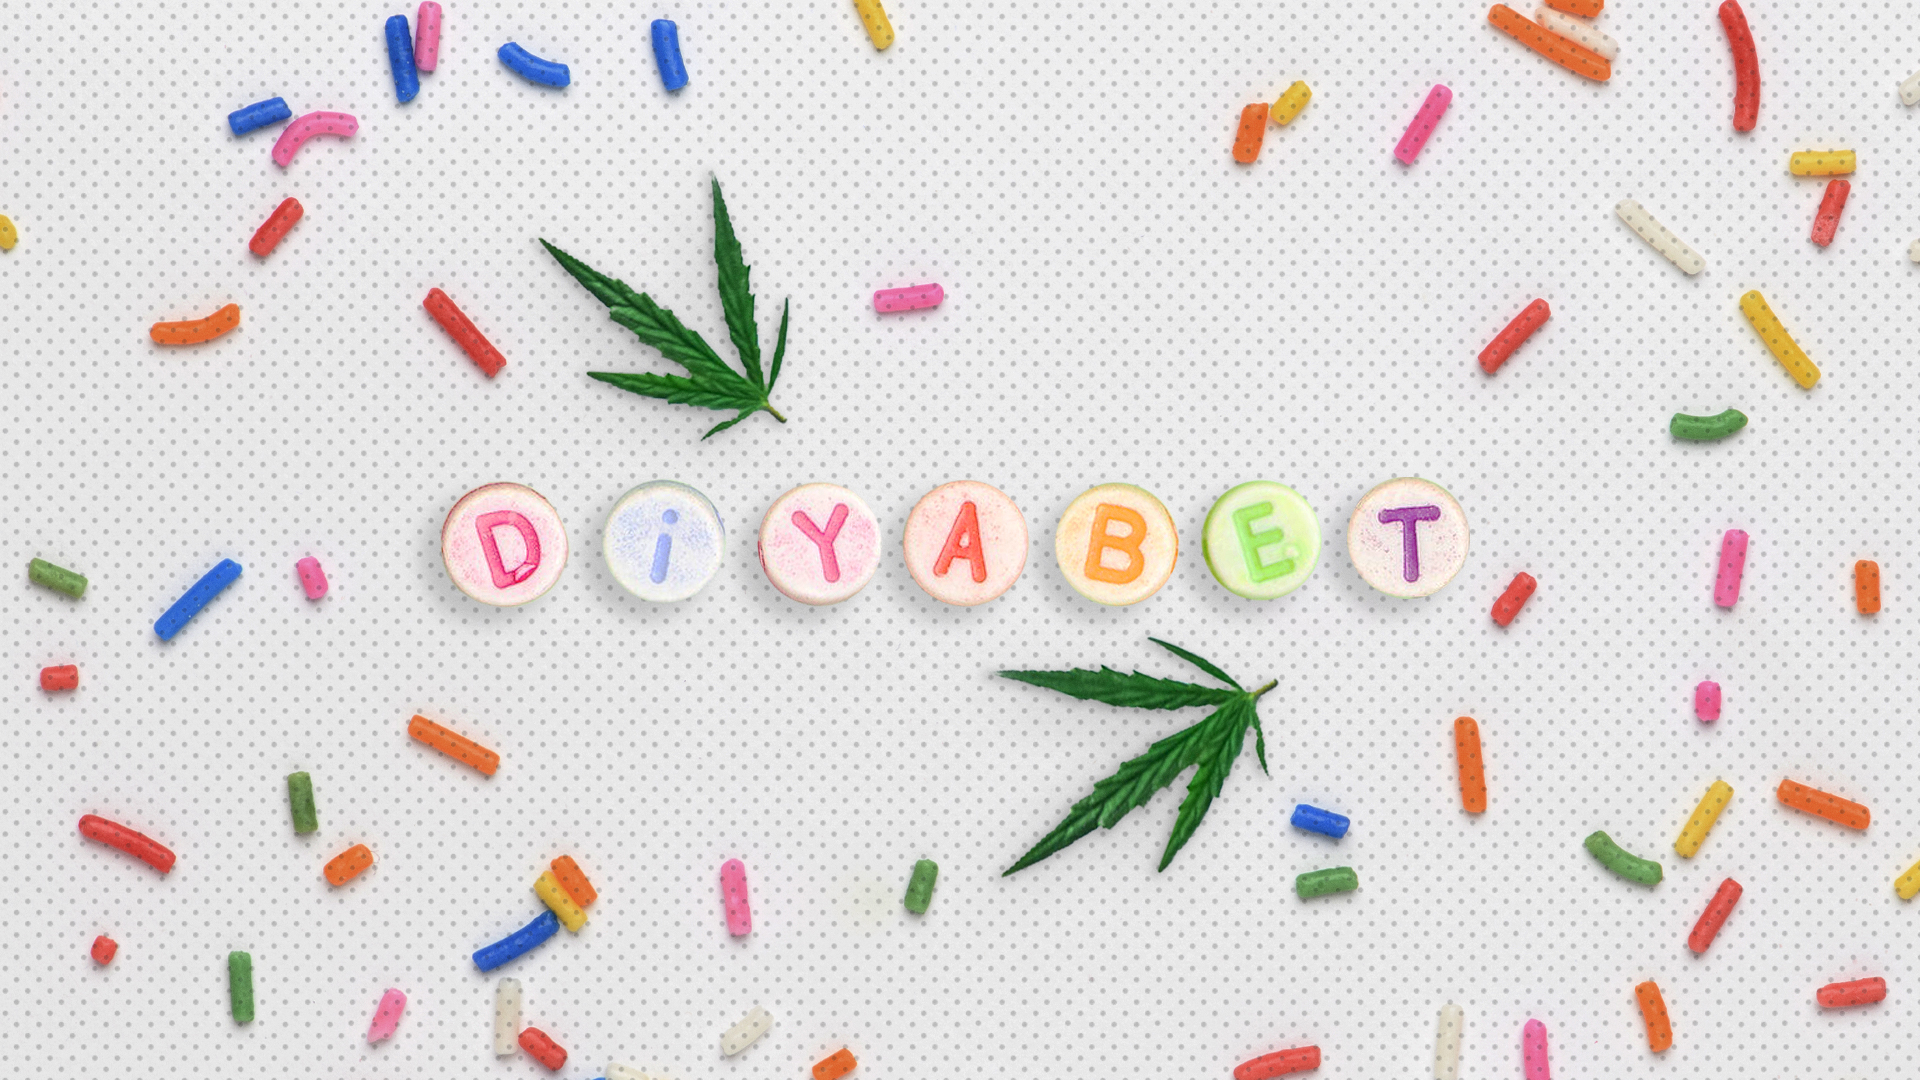 Diyabet Tedavisi icin CBD yagi kullanimi